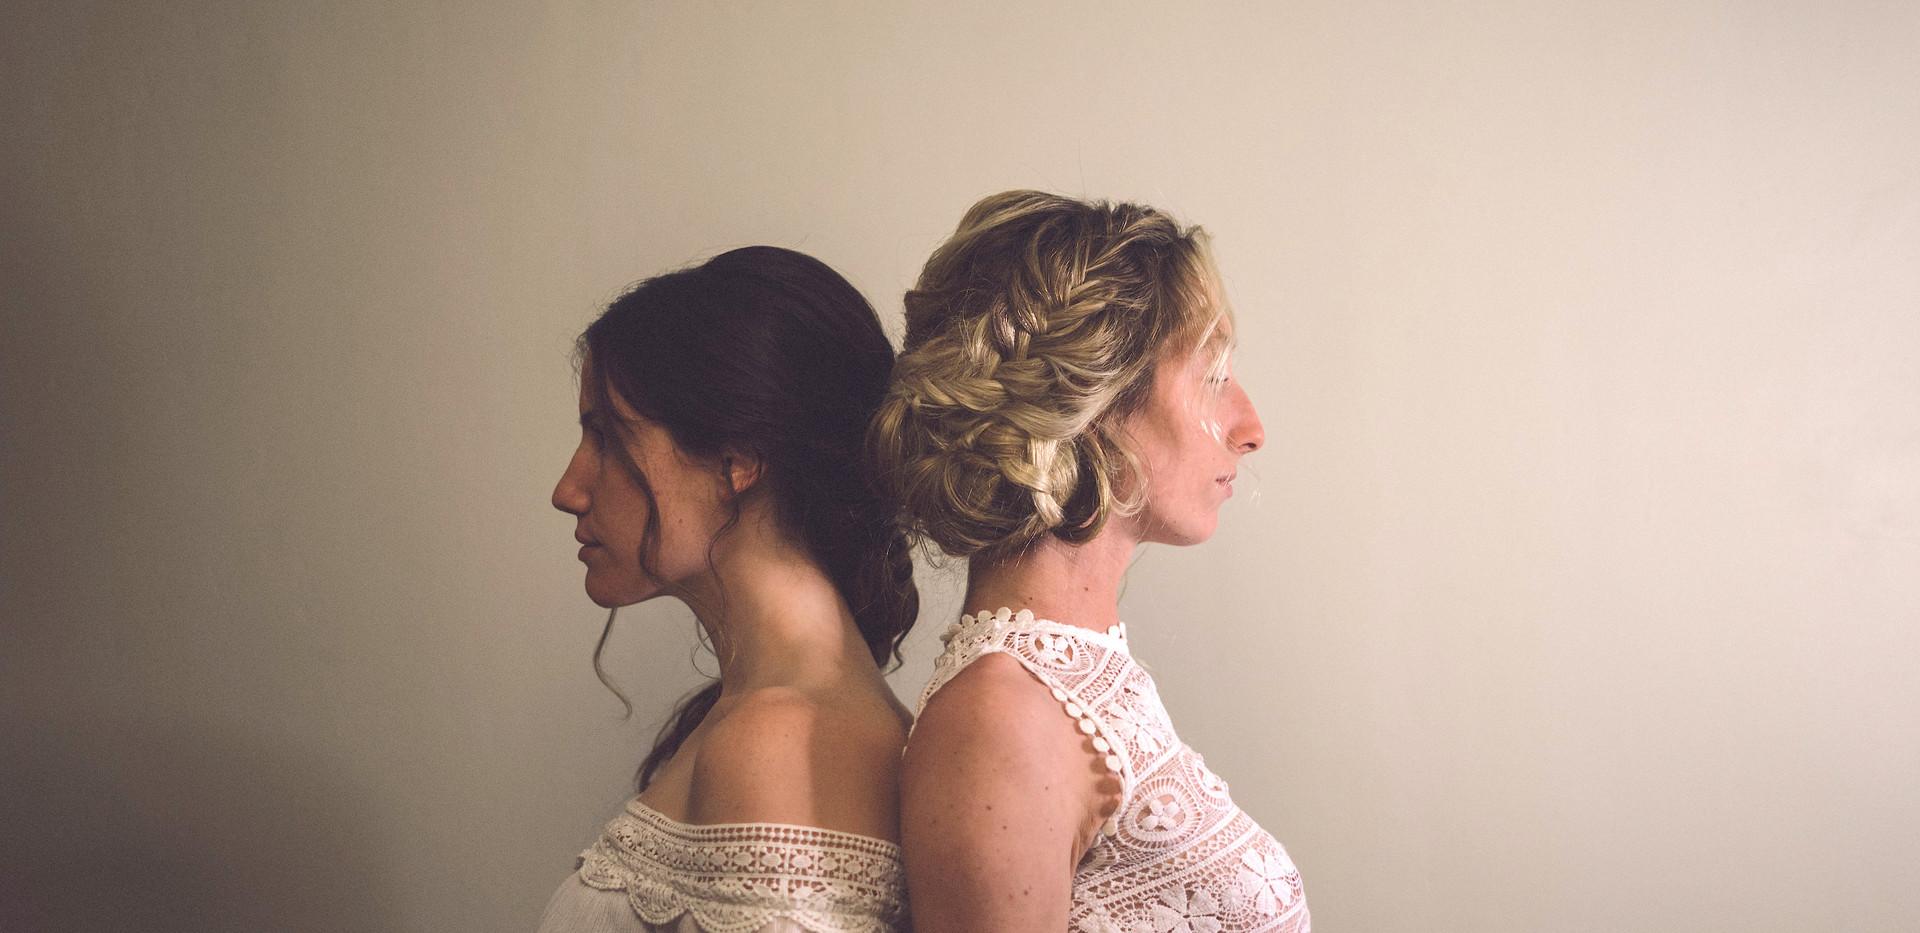 Hairstylist: Kaydee Traghella  Photographer: Nia Sherie Photo  Models: Maria Anthony & Celena Dionne  Stylist: Kaydee Traghella